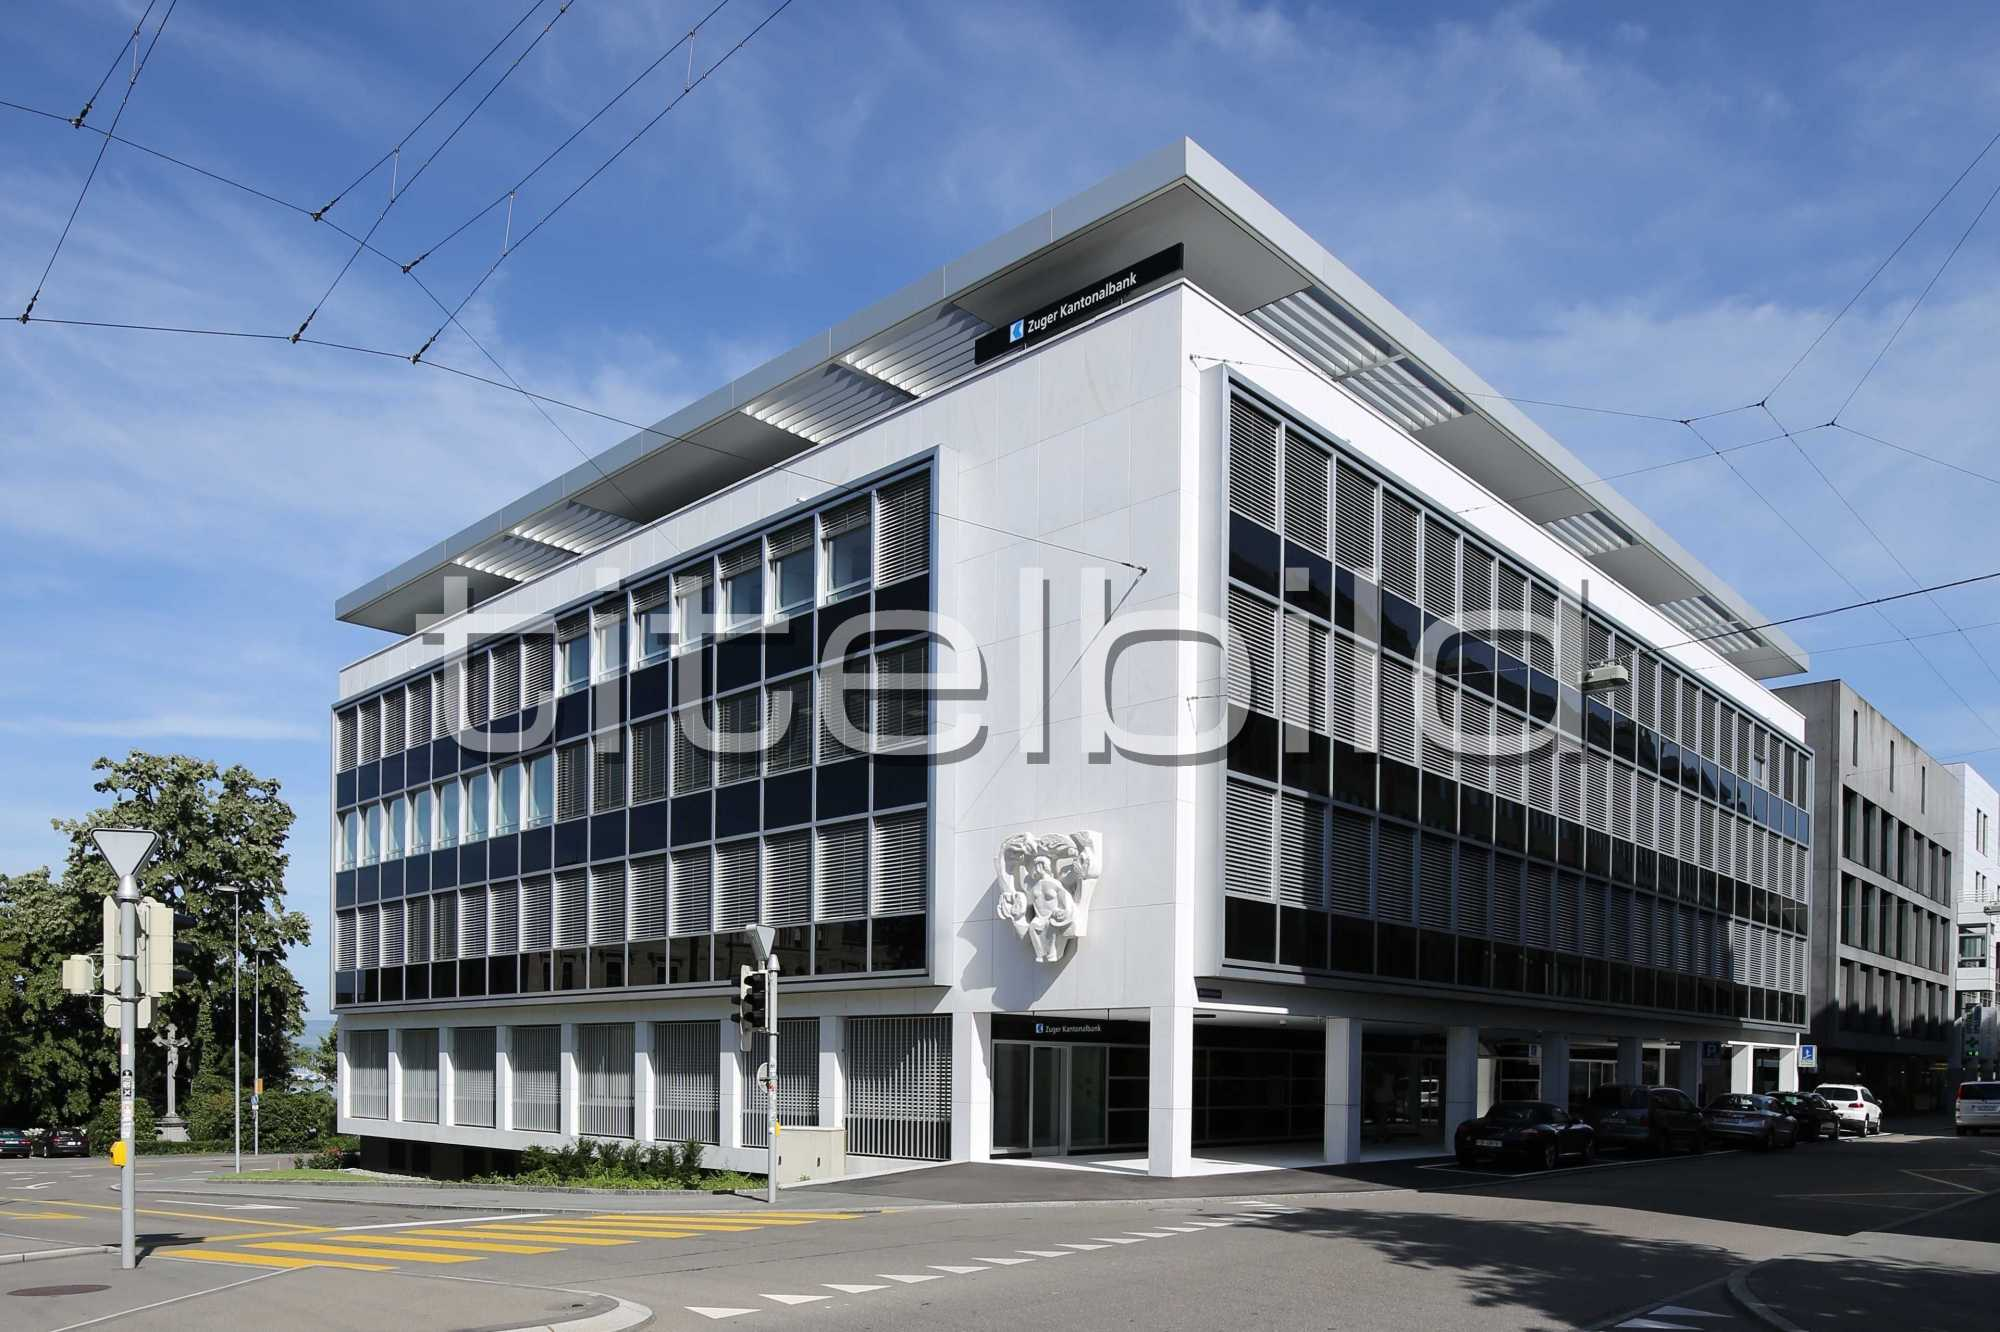 Projektbild-Nr. 2: Zuger Kantonalbank